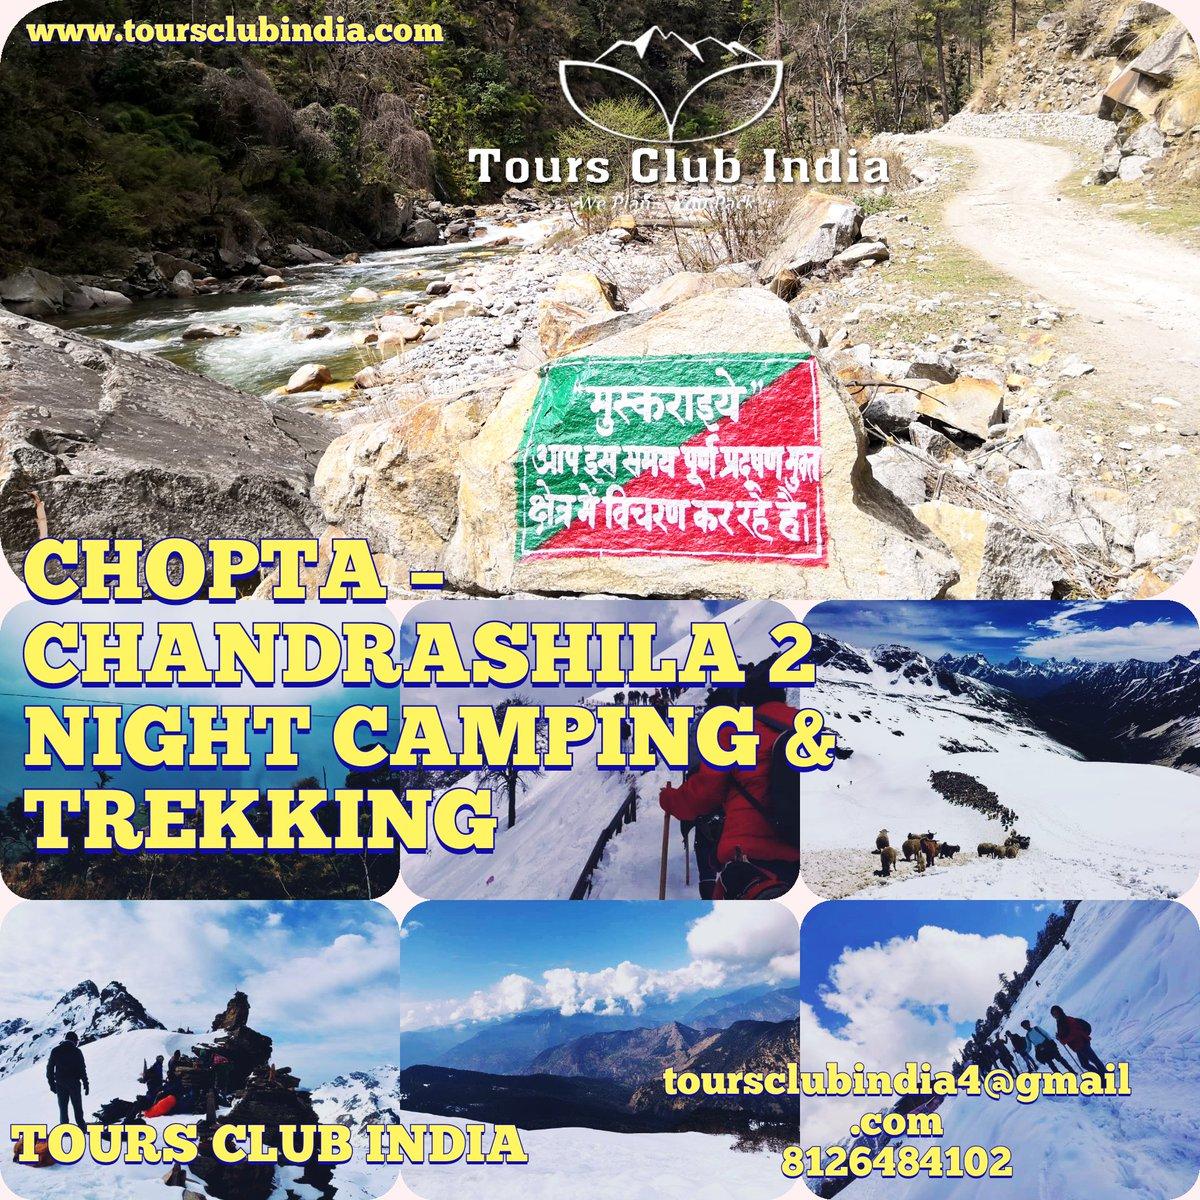 #chandrashila #chopta #uttarakhand #tungnath #kedarnath #uttarakhandheaven #himalayas #mountains #rishikesh #trekking #incredibleindia #garhwal #uttrakhand #rudraprayag #badrinath #india #travel #uttarakhandtourism #dehradun #nature #tungnathtrek #mahadev #travelphotography https://t.co/dSgZC83O6p